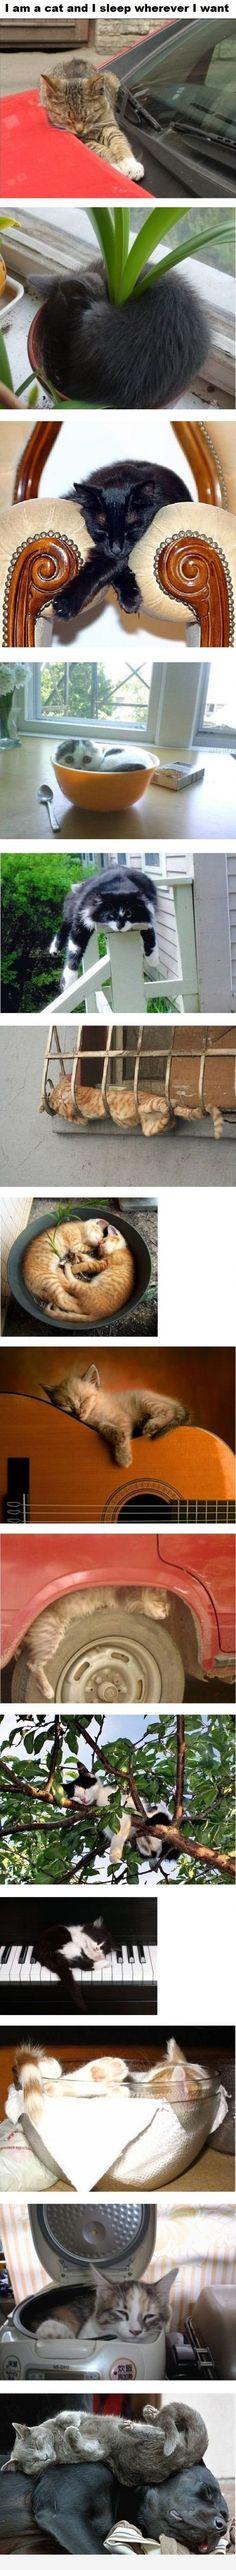 this makes me giggle. i adore kitties! @Cherie Frieberg and @Erika Frieberg